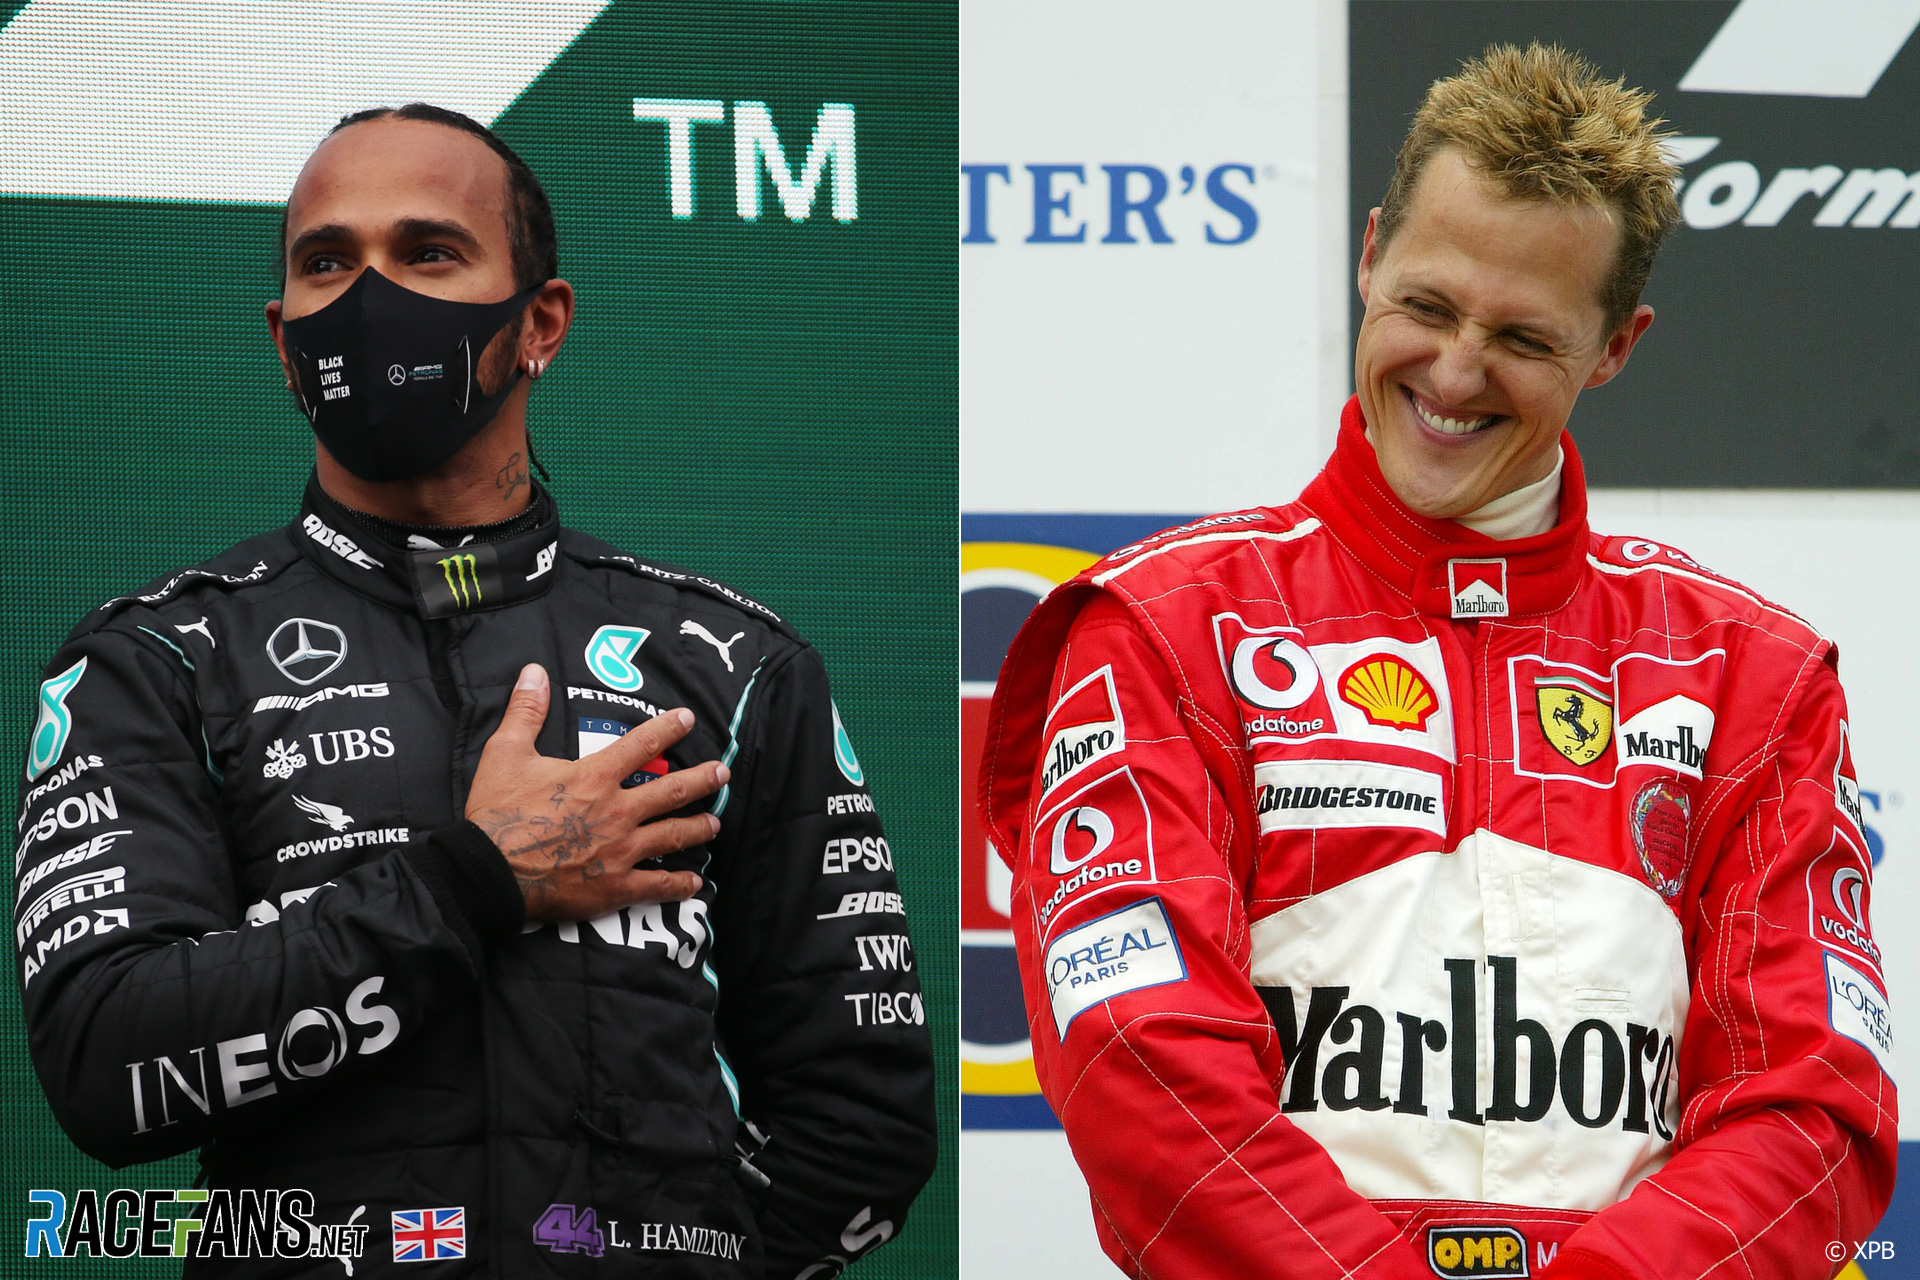 F1's seven-times champions: Hamilton and Schumacher